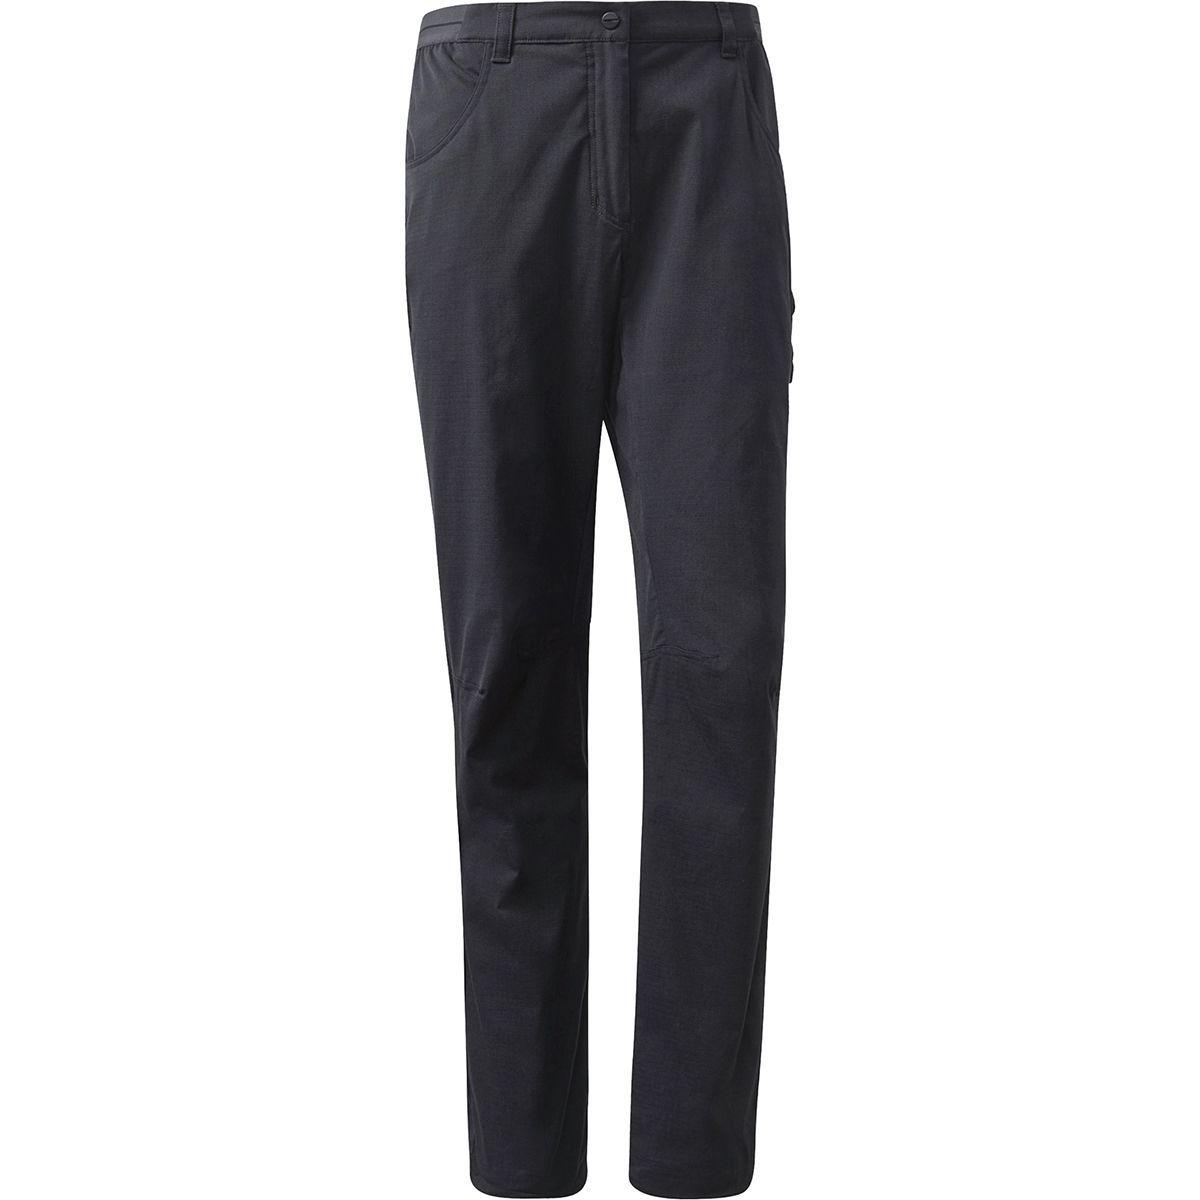 Adidas Outdoor Felsblock Pant - Men's